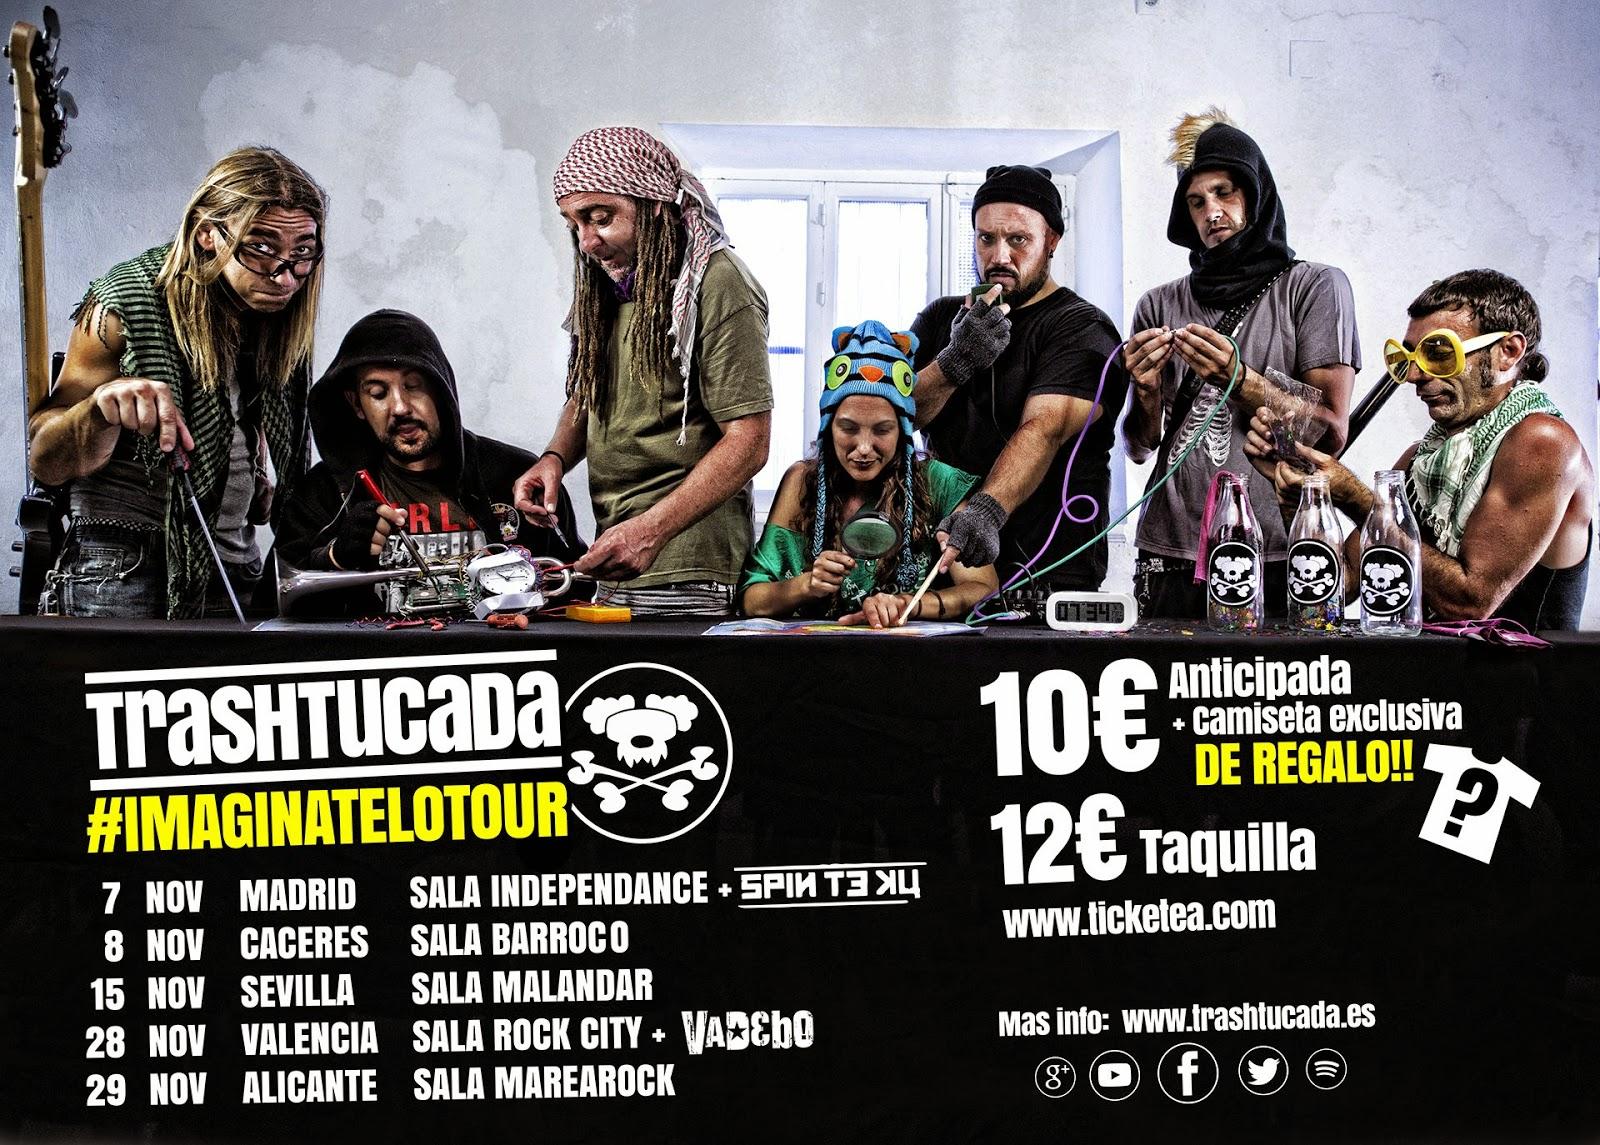 https://www.ticketea.com/trashtucada-en-madrid/